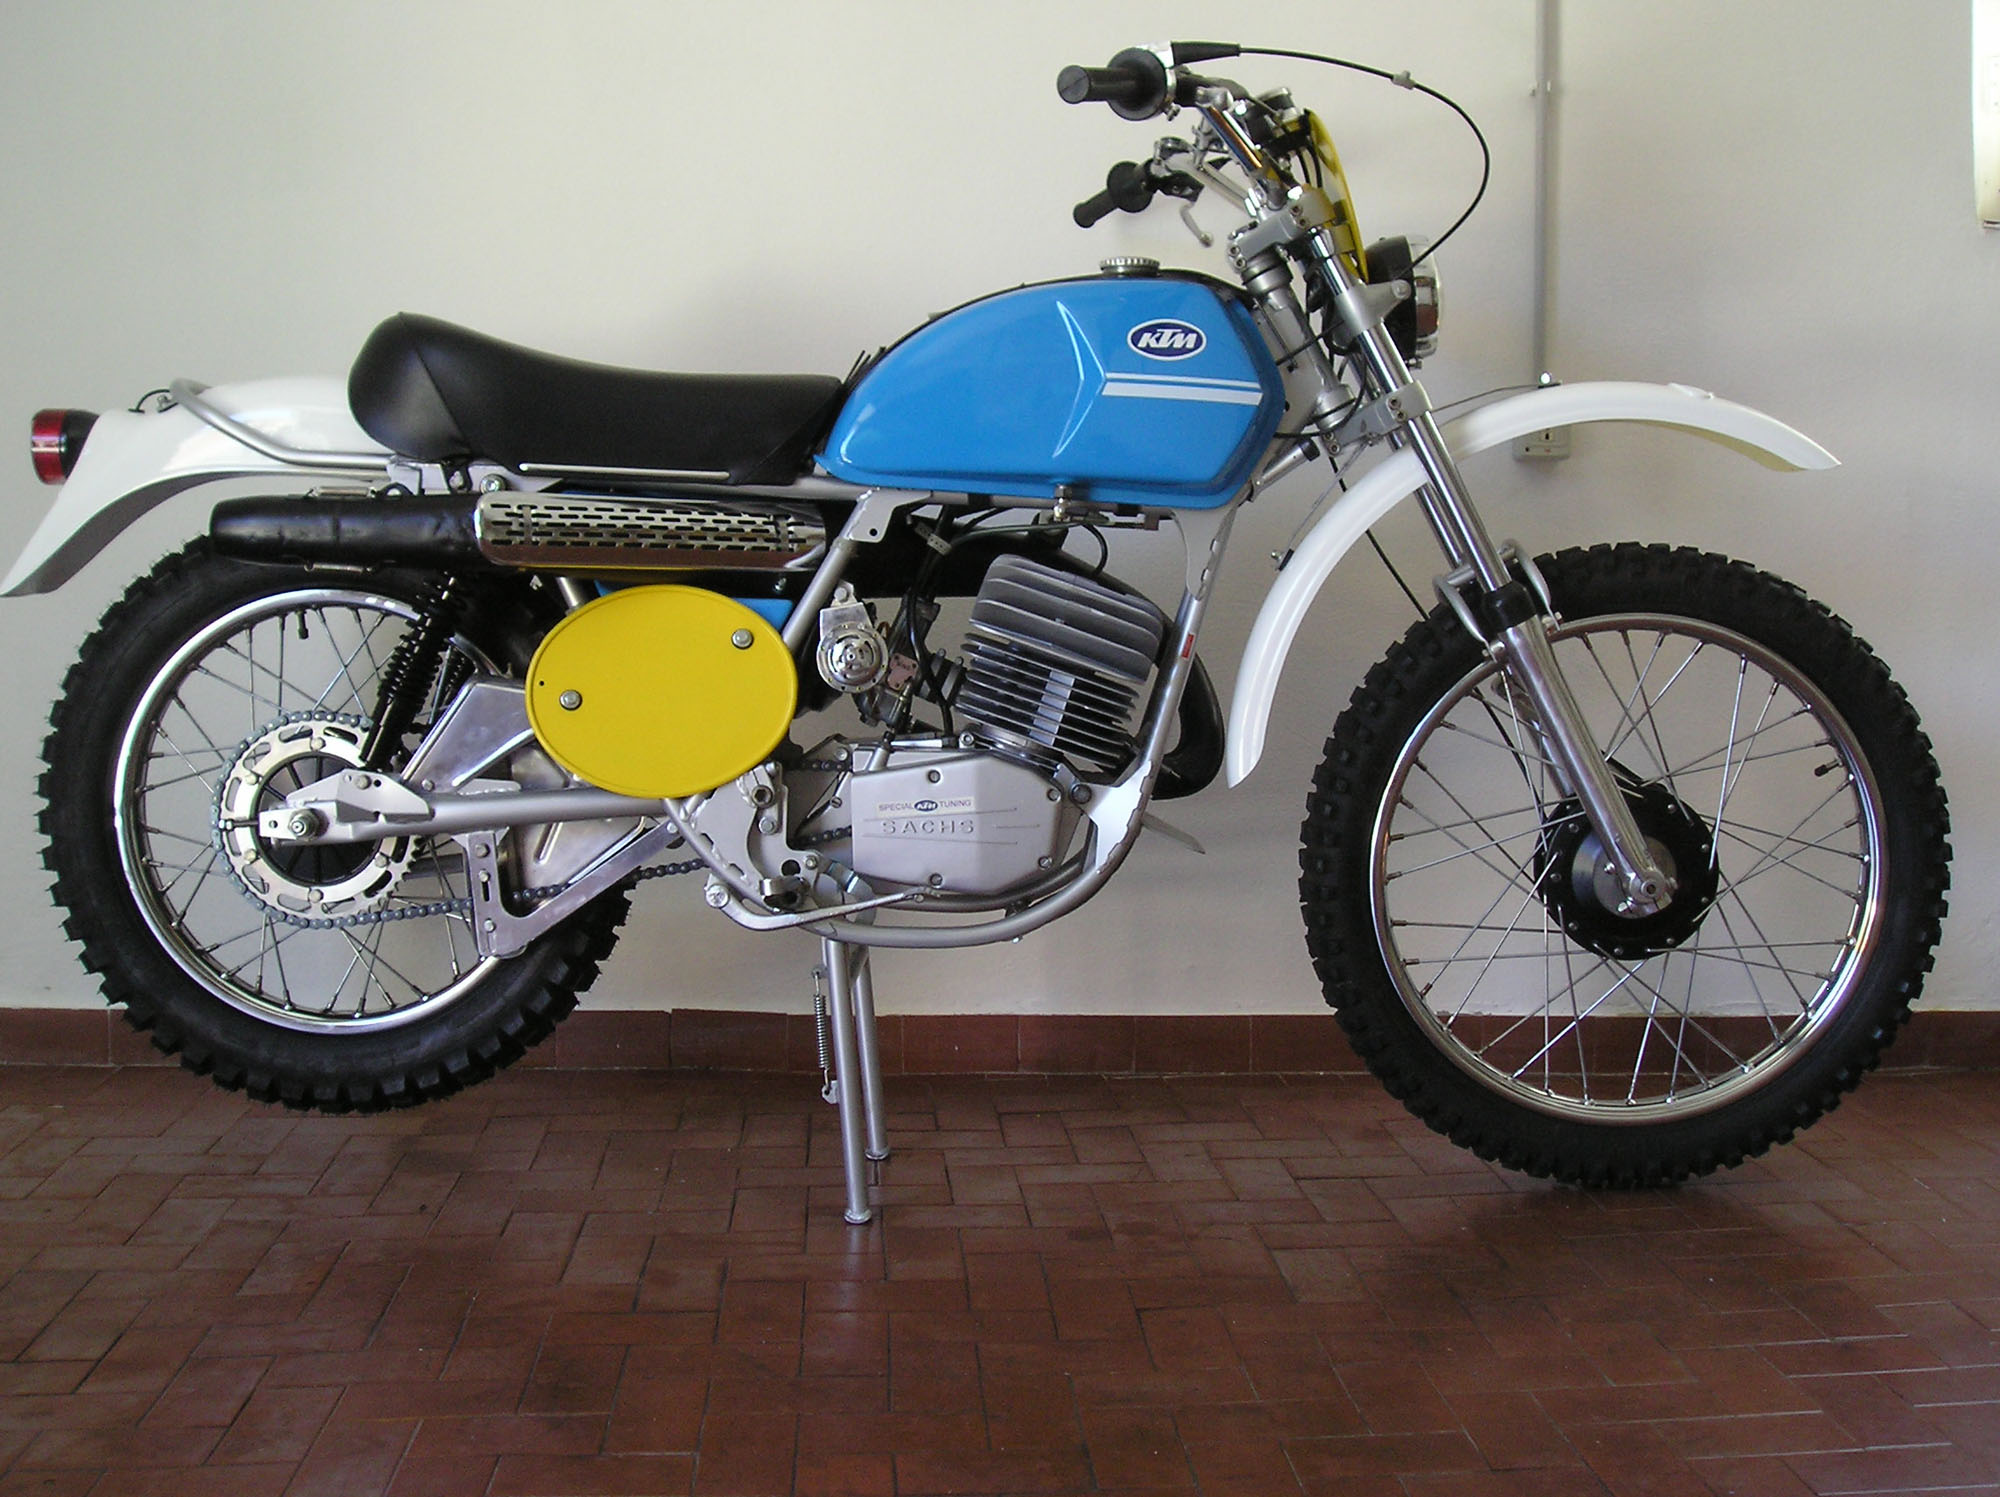 KTM 125 GS